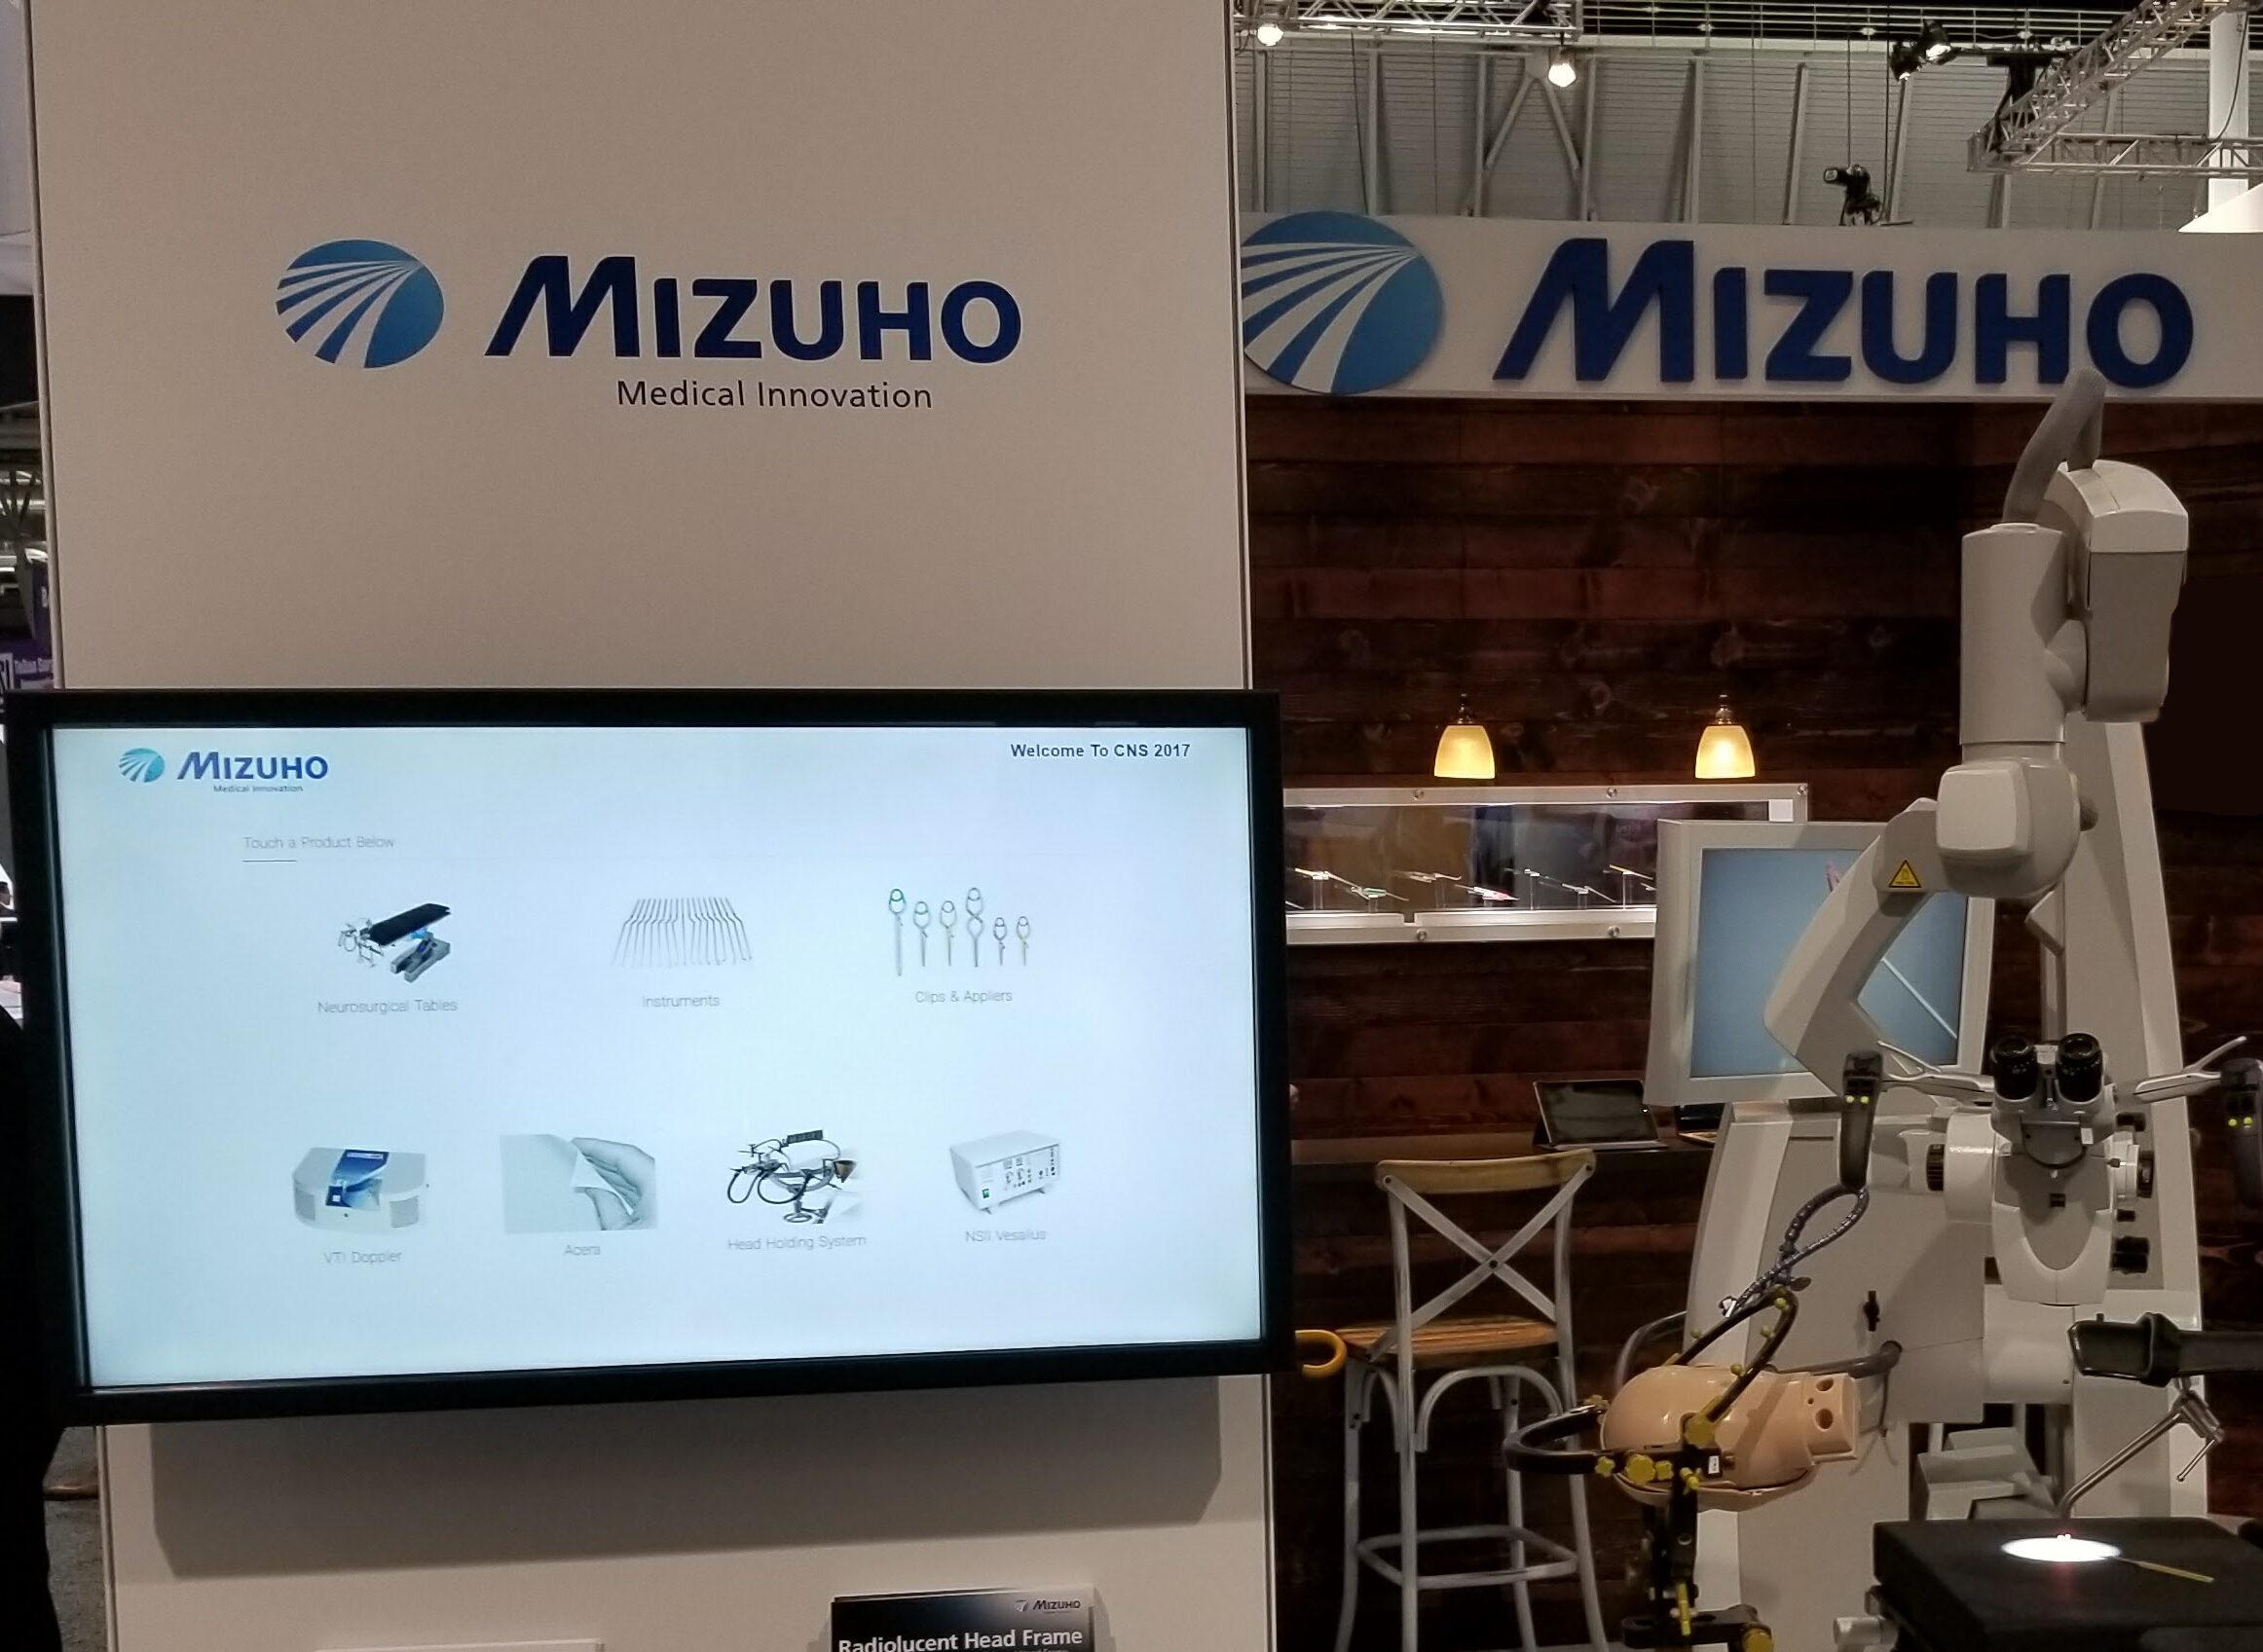 Mizuho Tradeshow